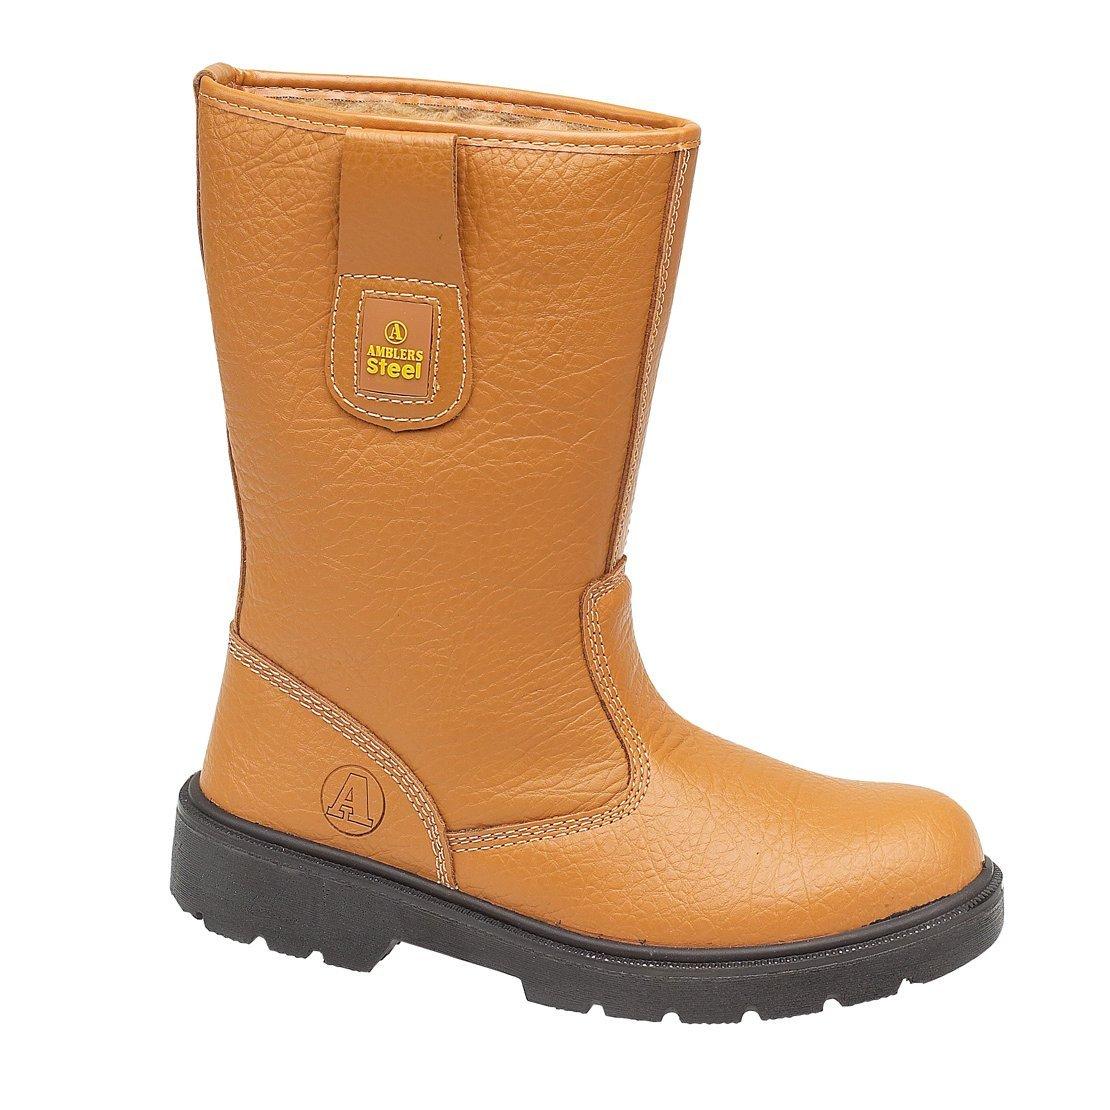 Amblers Fs124 Resiste Hombre Ponerse Botas Botines Zapatos 48 EU Tan